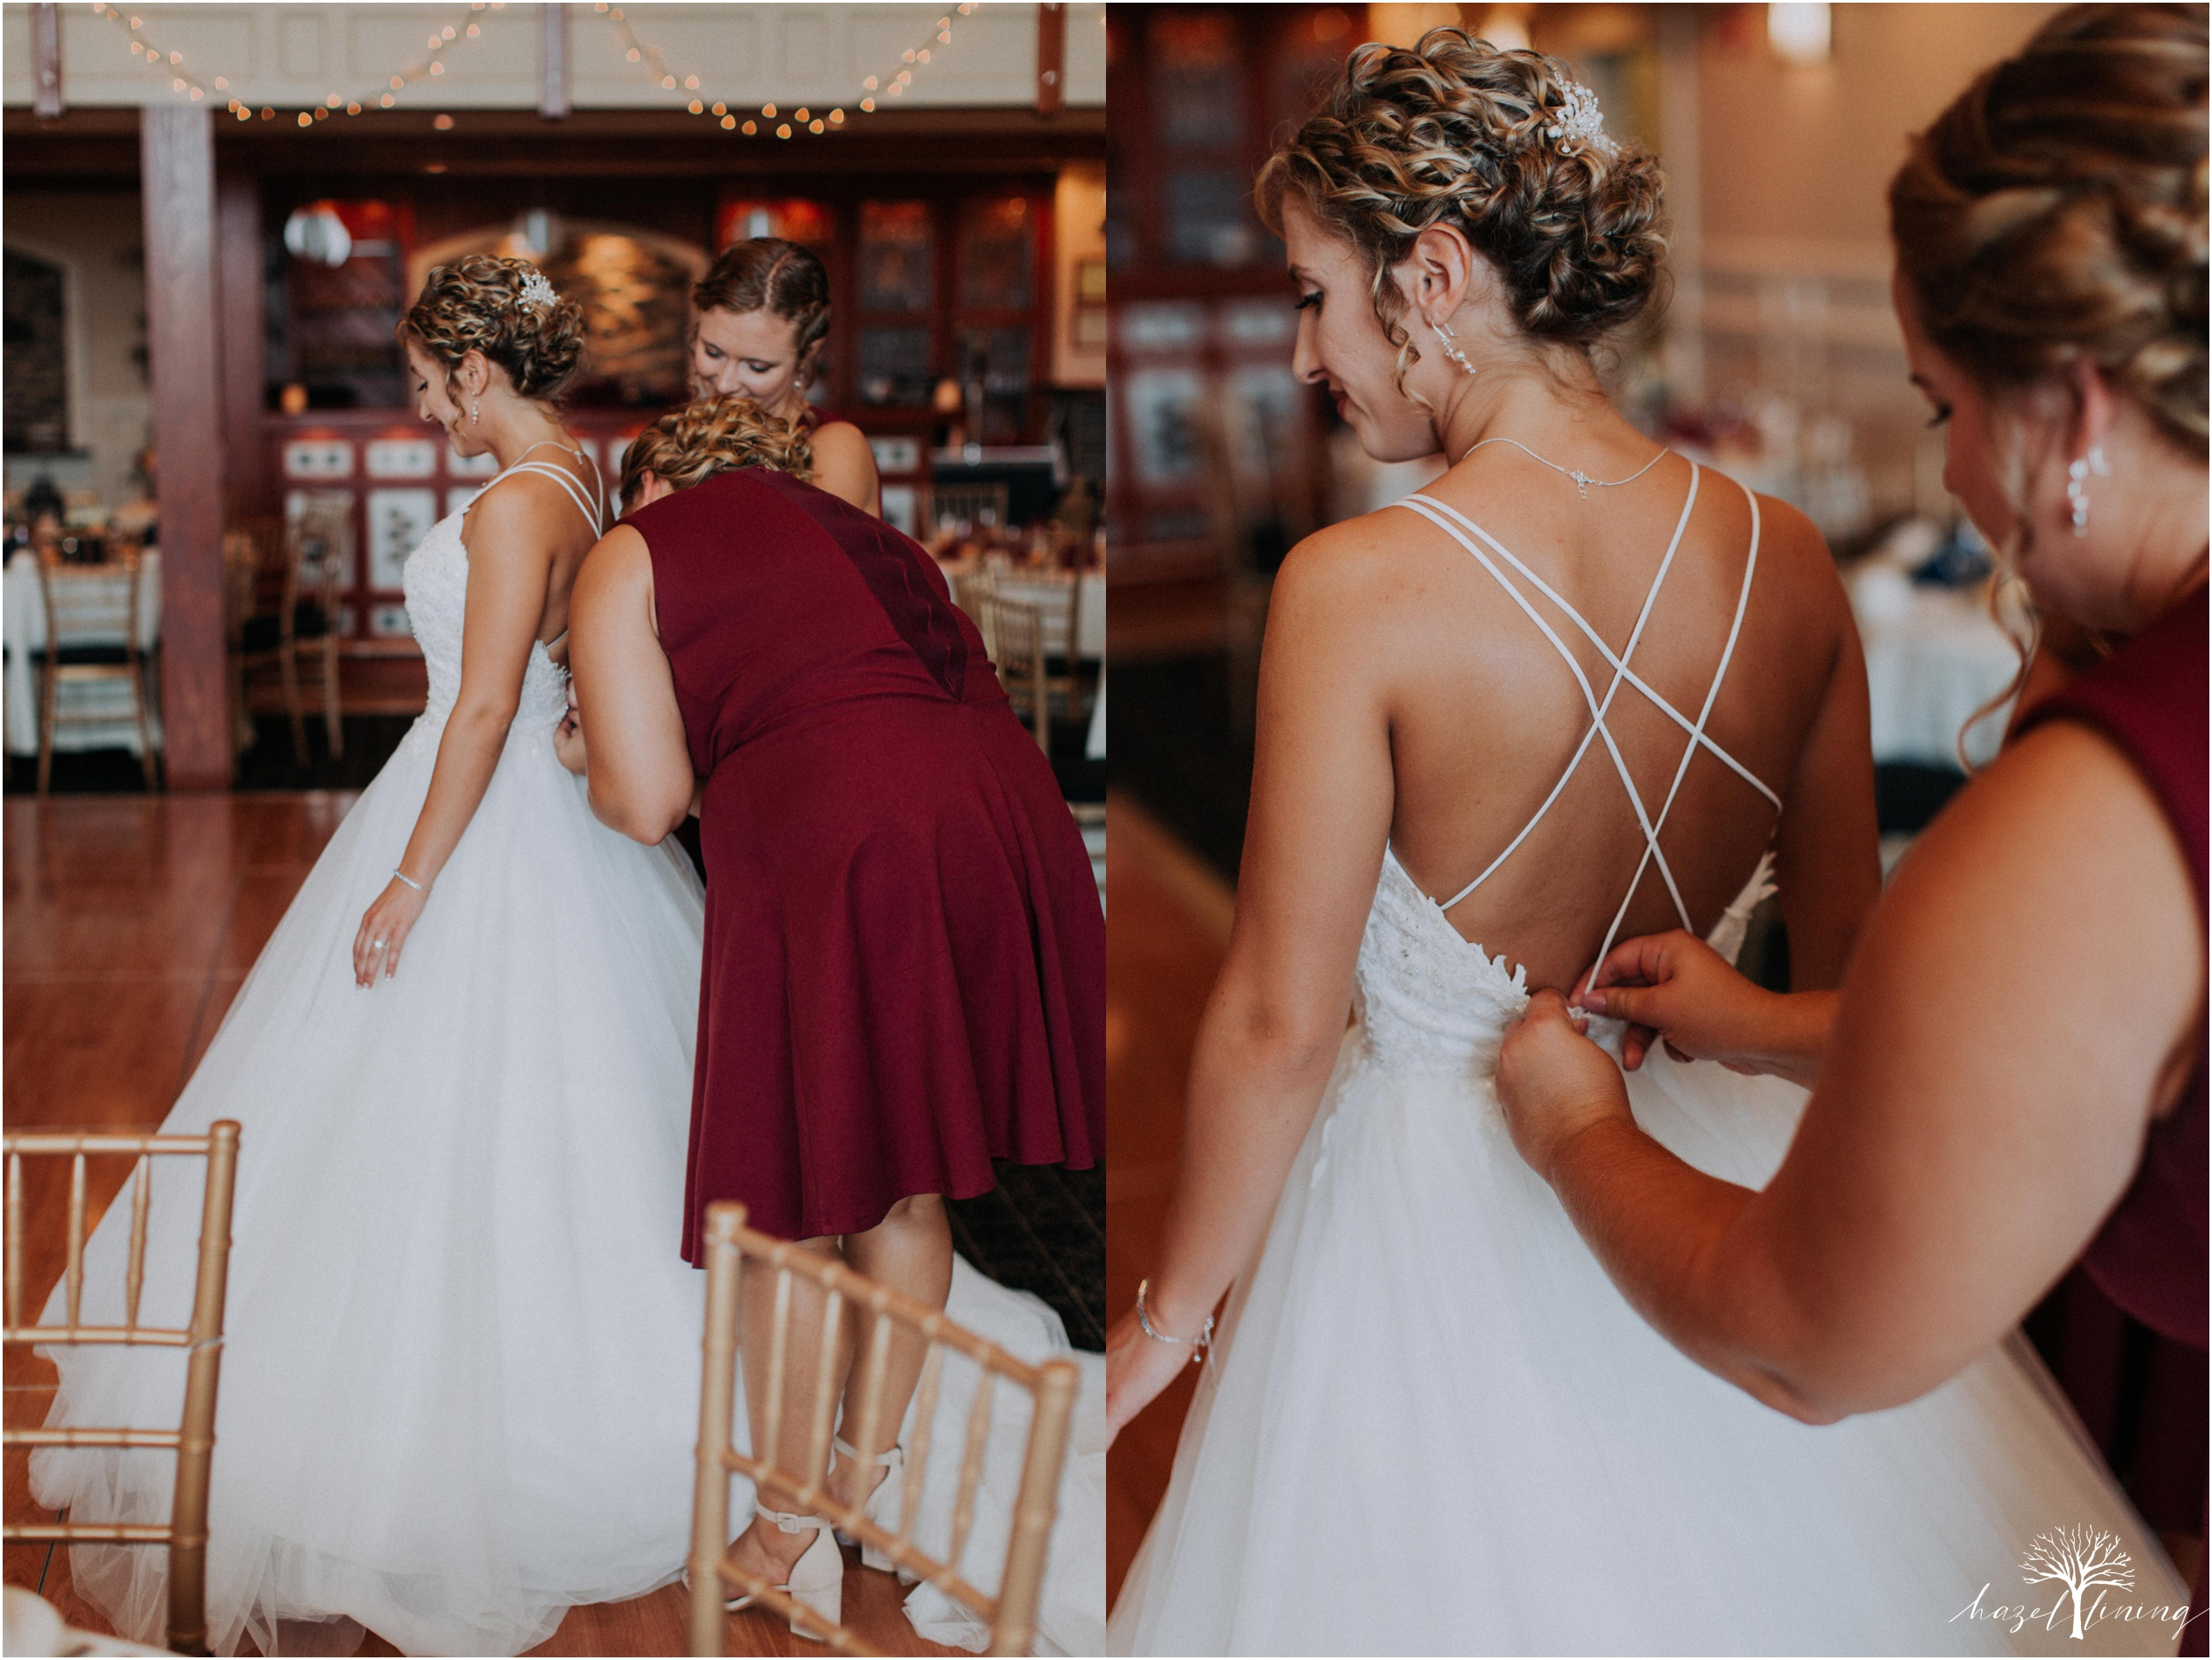 jonathan-weibel-becky-haywood-loft-at-sweetwater-cc-pennsburg-pennsylvania-rainy-day-summer-wedding-hazel-lining-travel-wedding-elopement-photography_0018.jpg